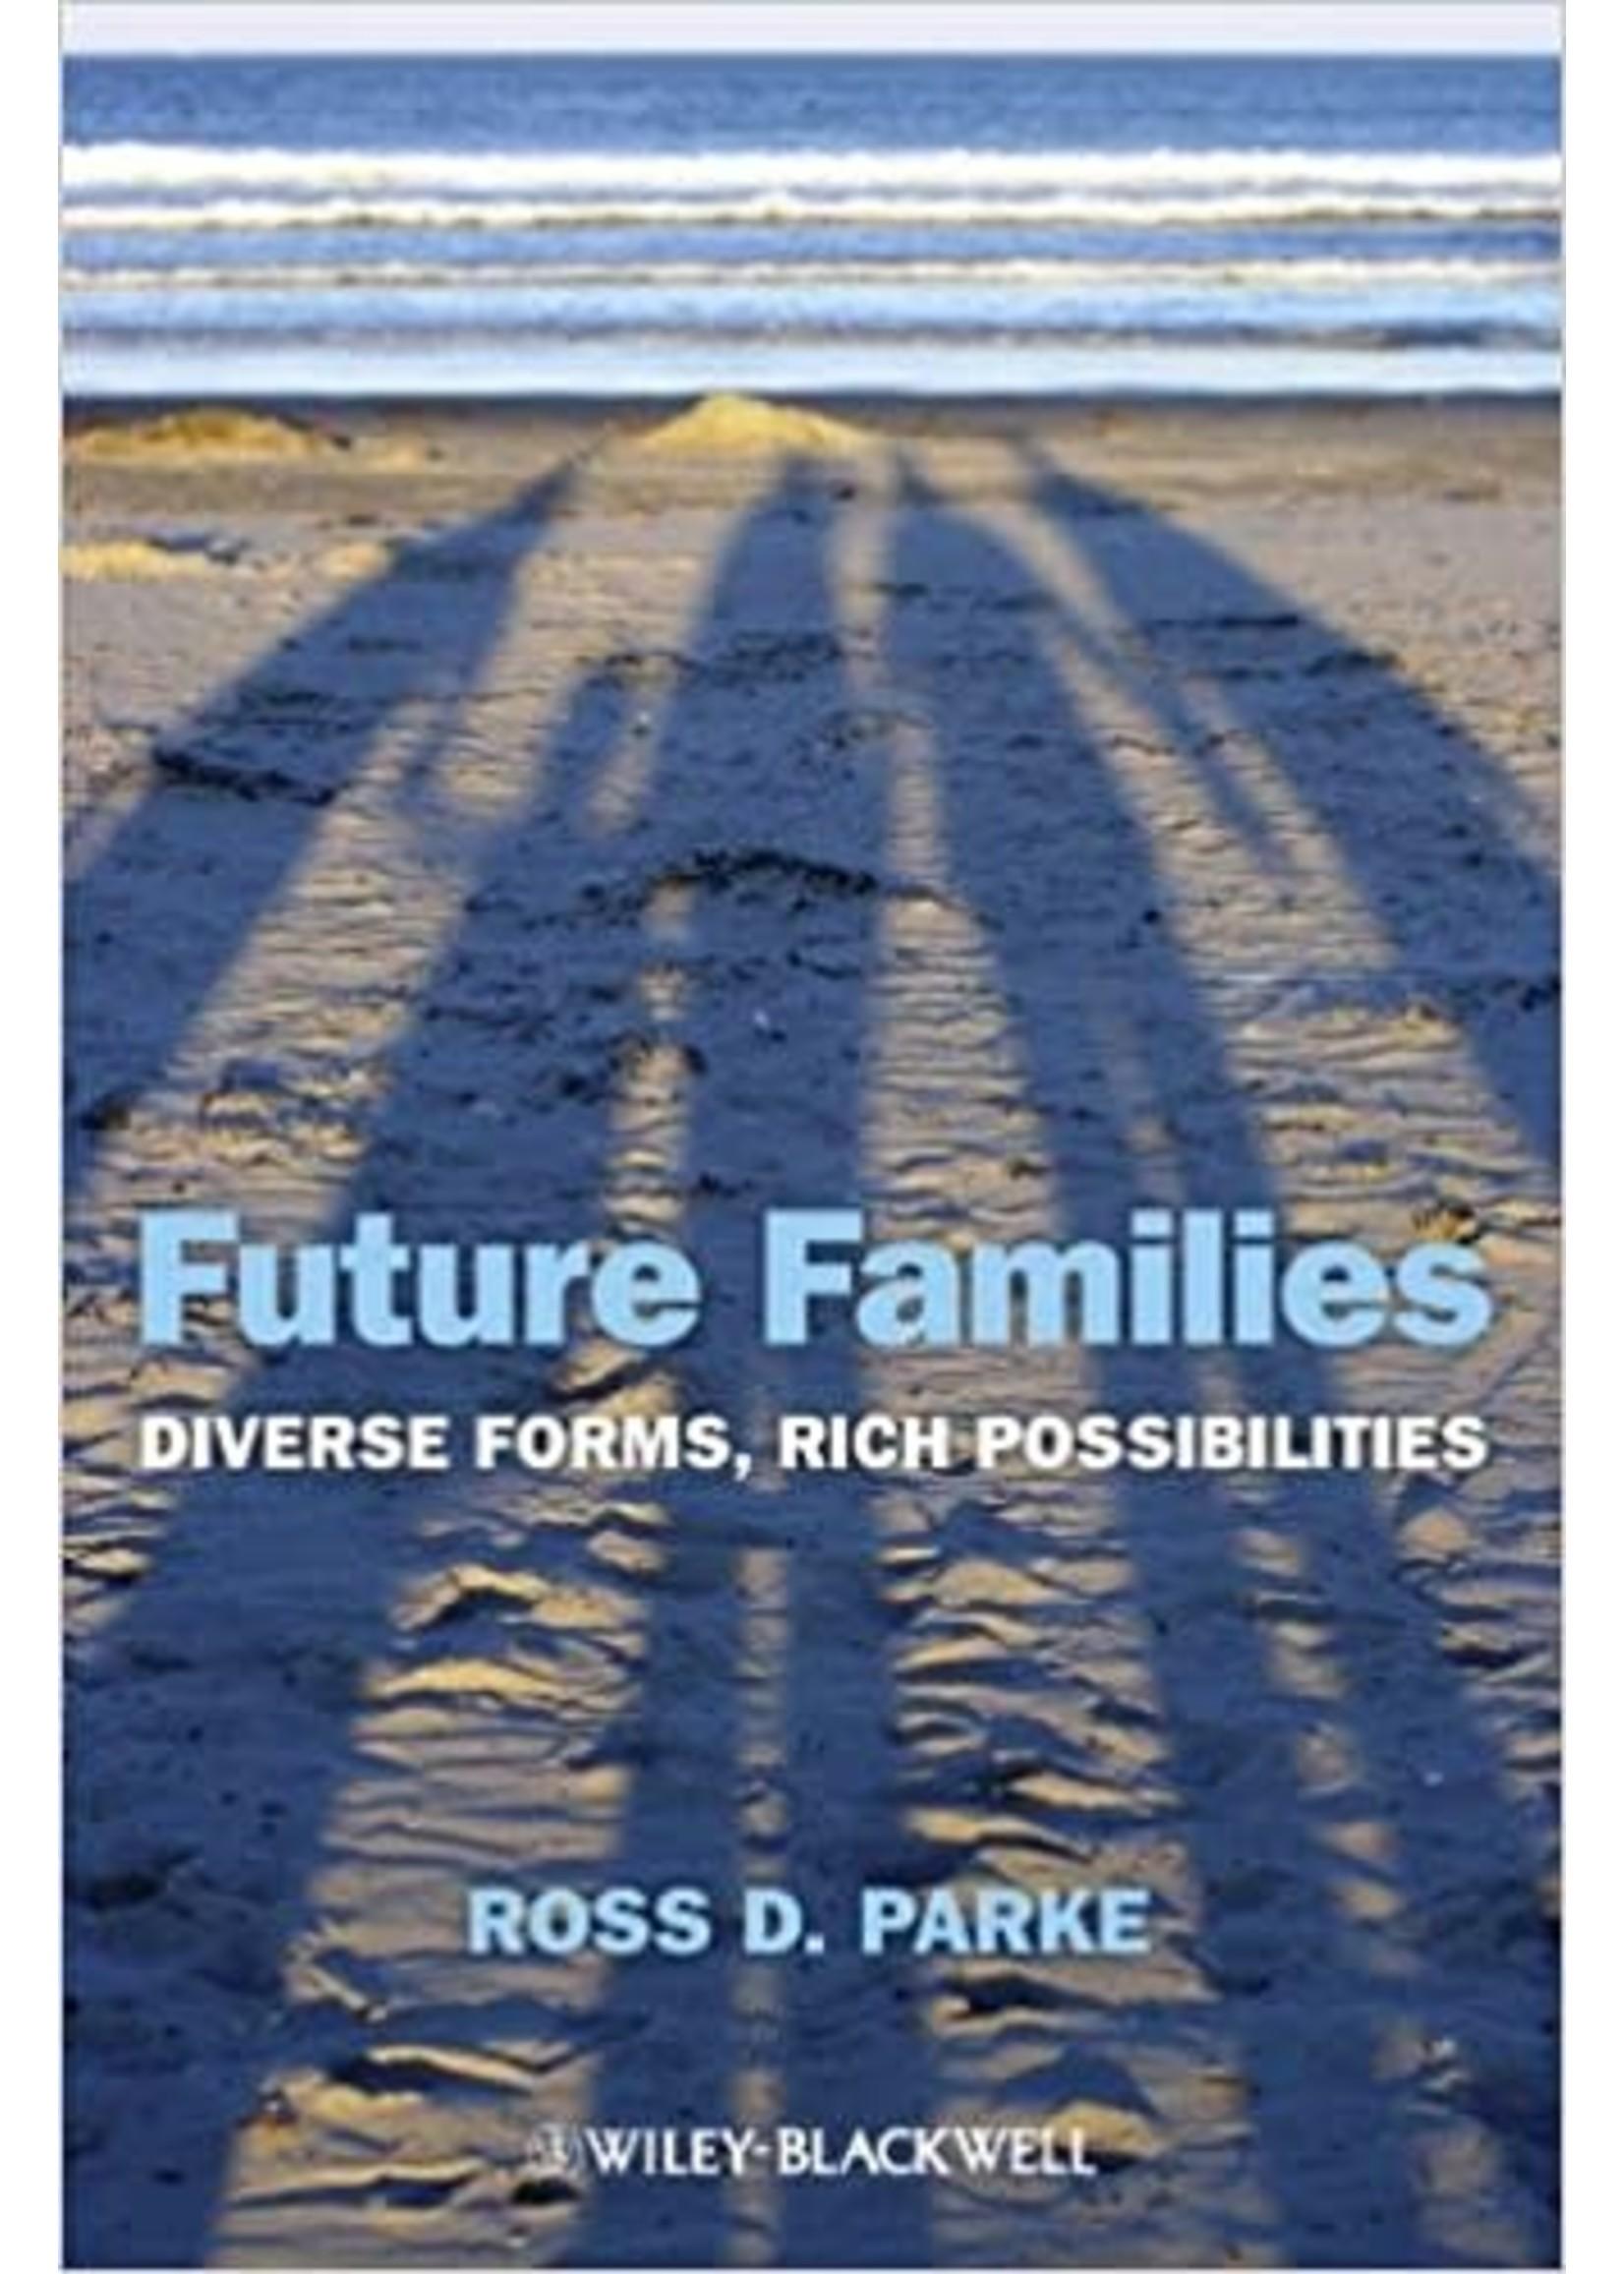 PSYC382 FUTURE FAMILIES (RENTAL)